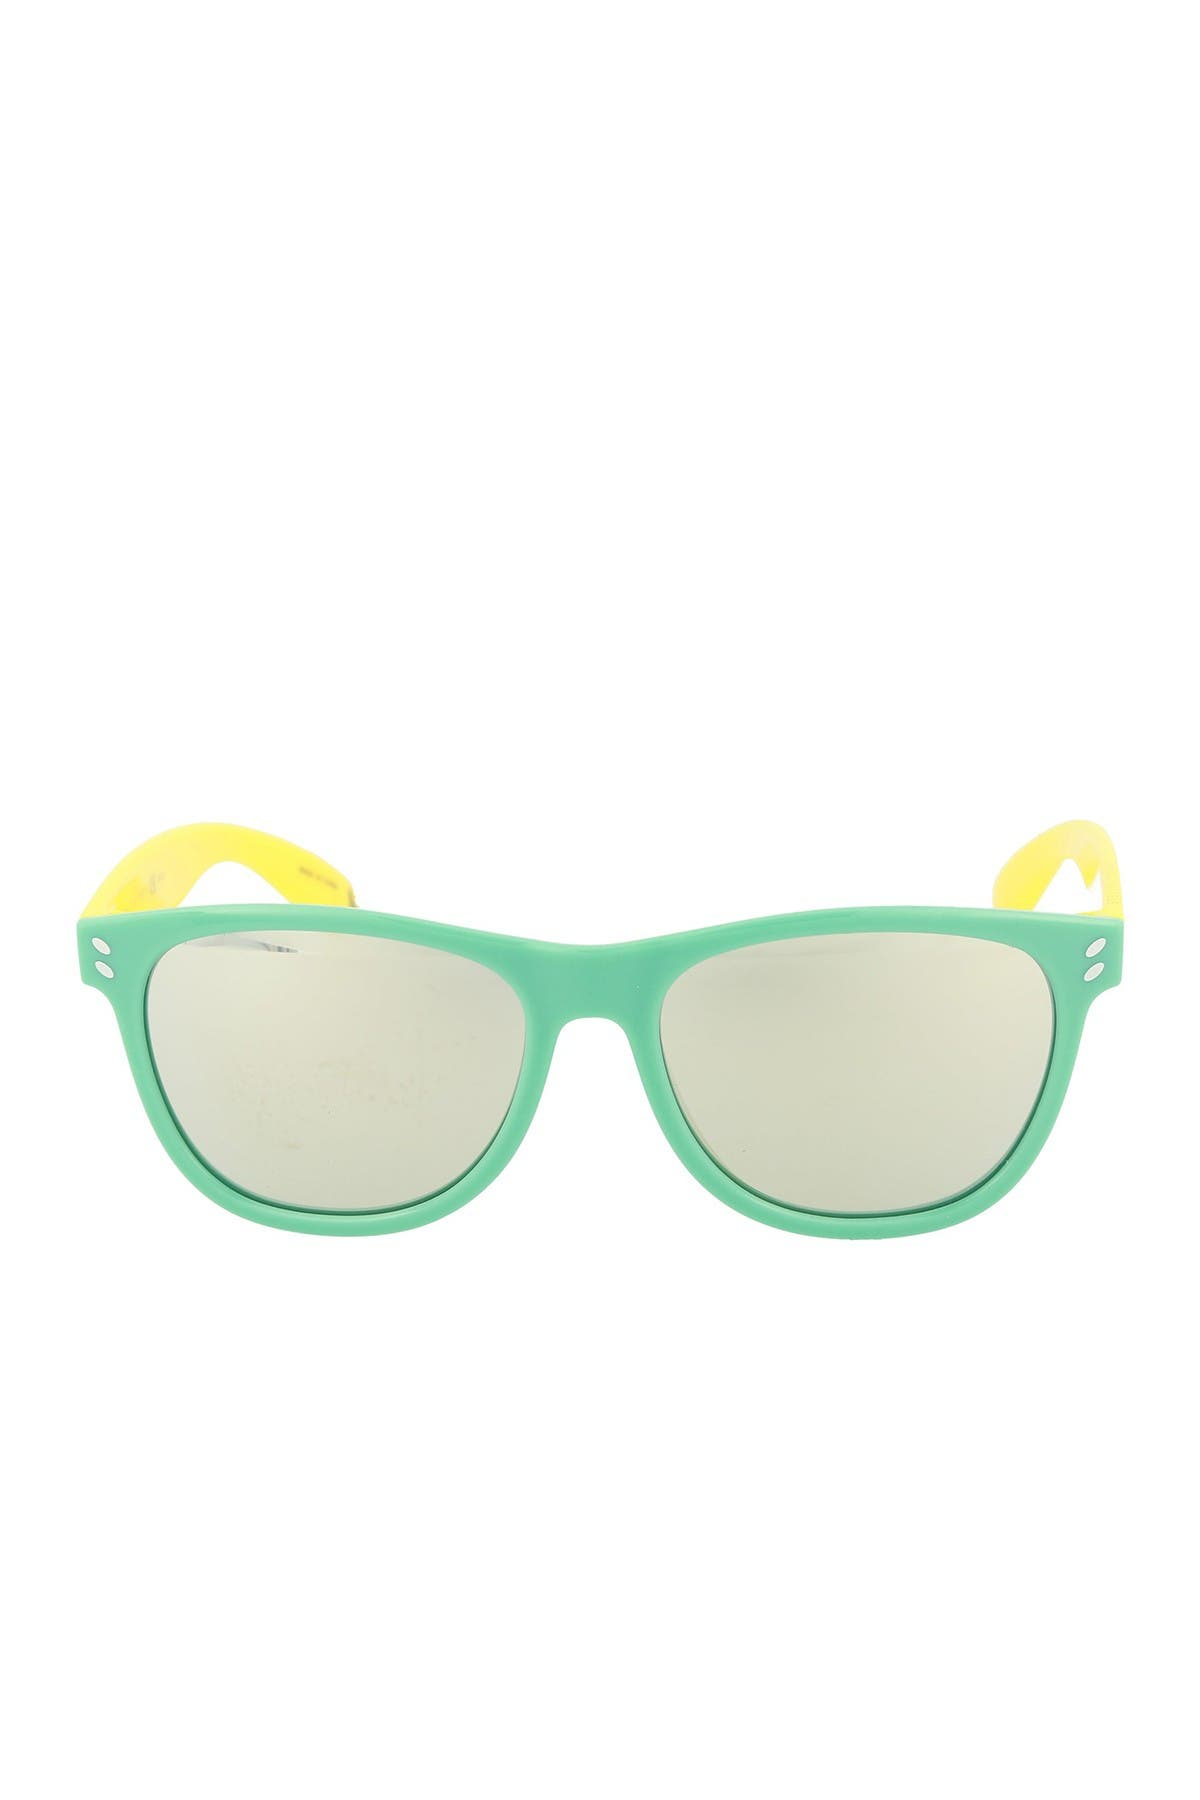 Image of Stella McCartney 49mm Clubmaster Sunglasses